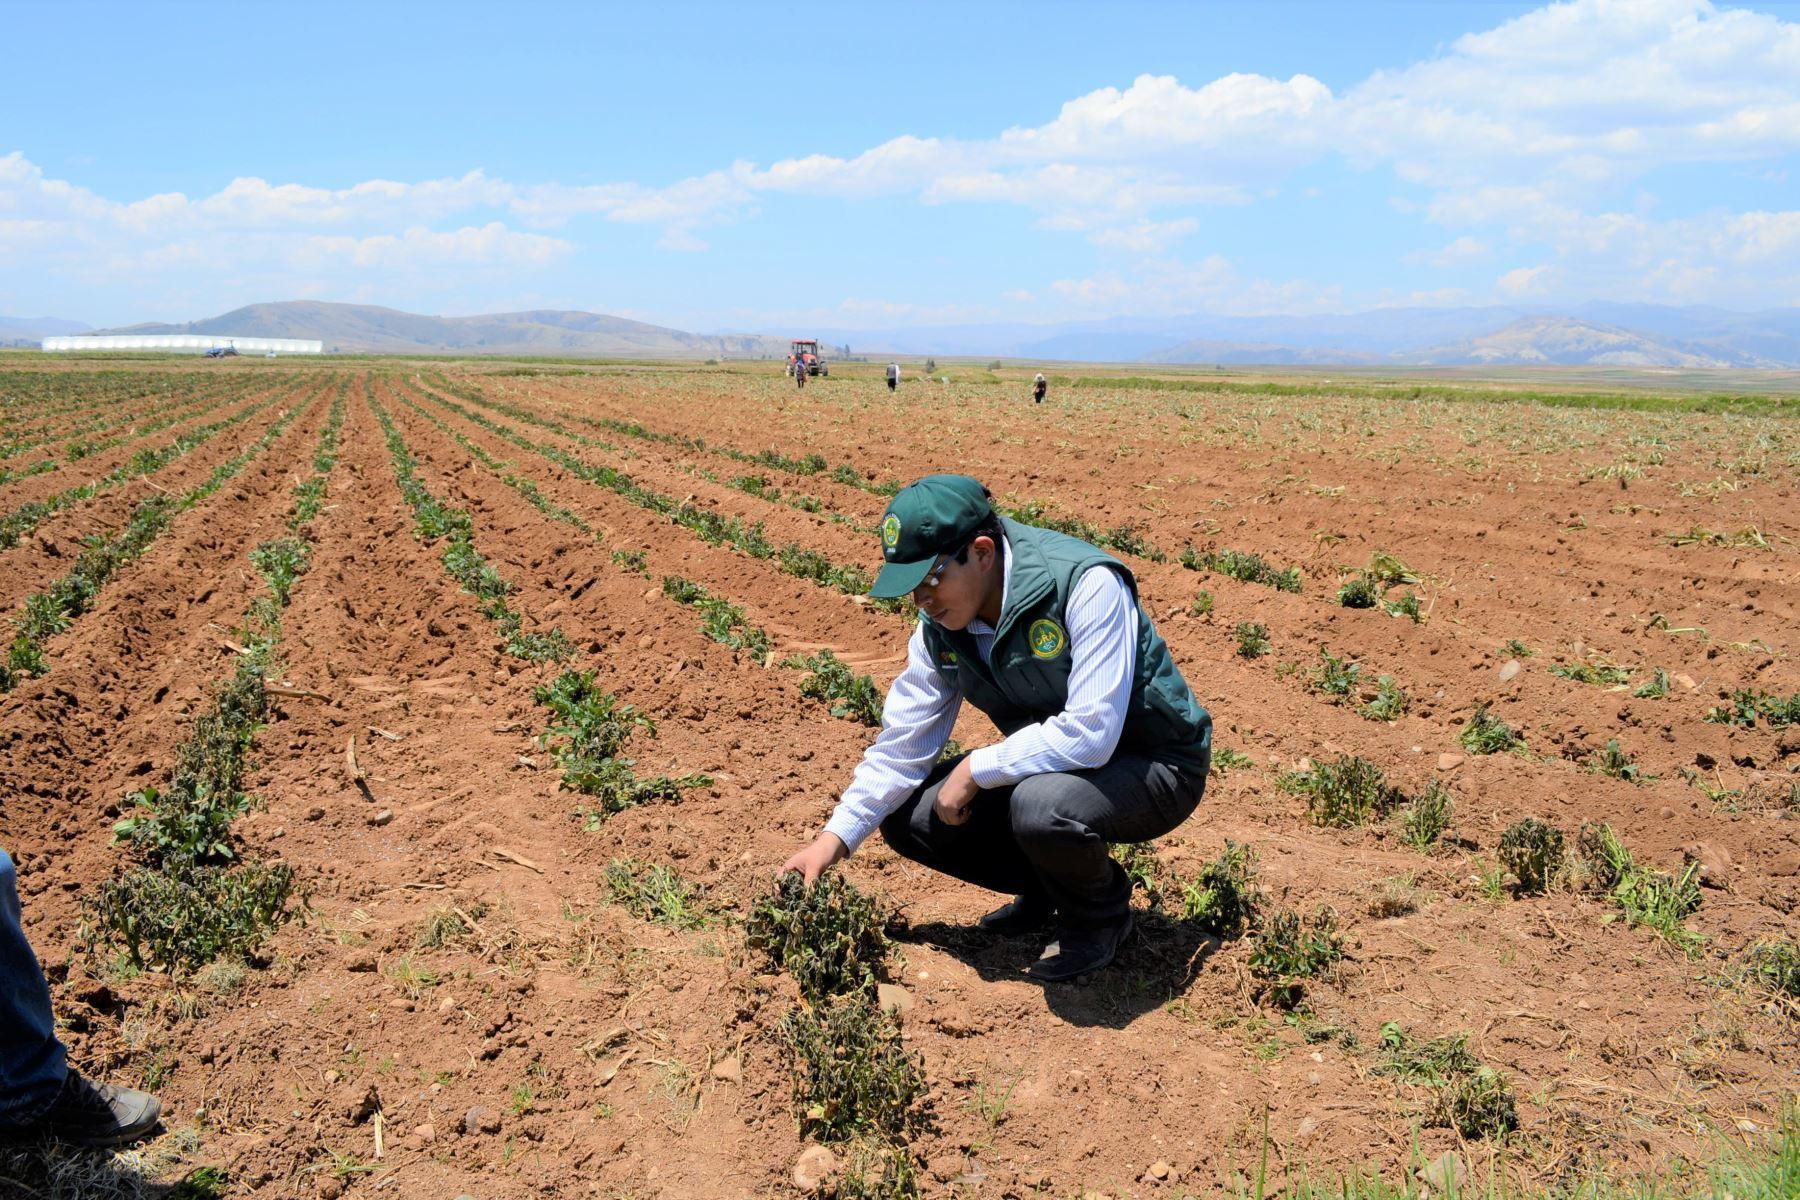 midagri-creo-grupo-de-trabajo-para-segunda-reforma-agraria